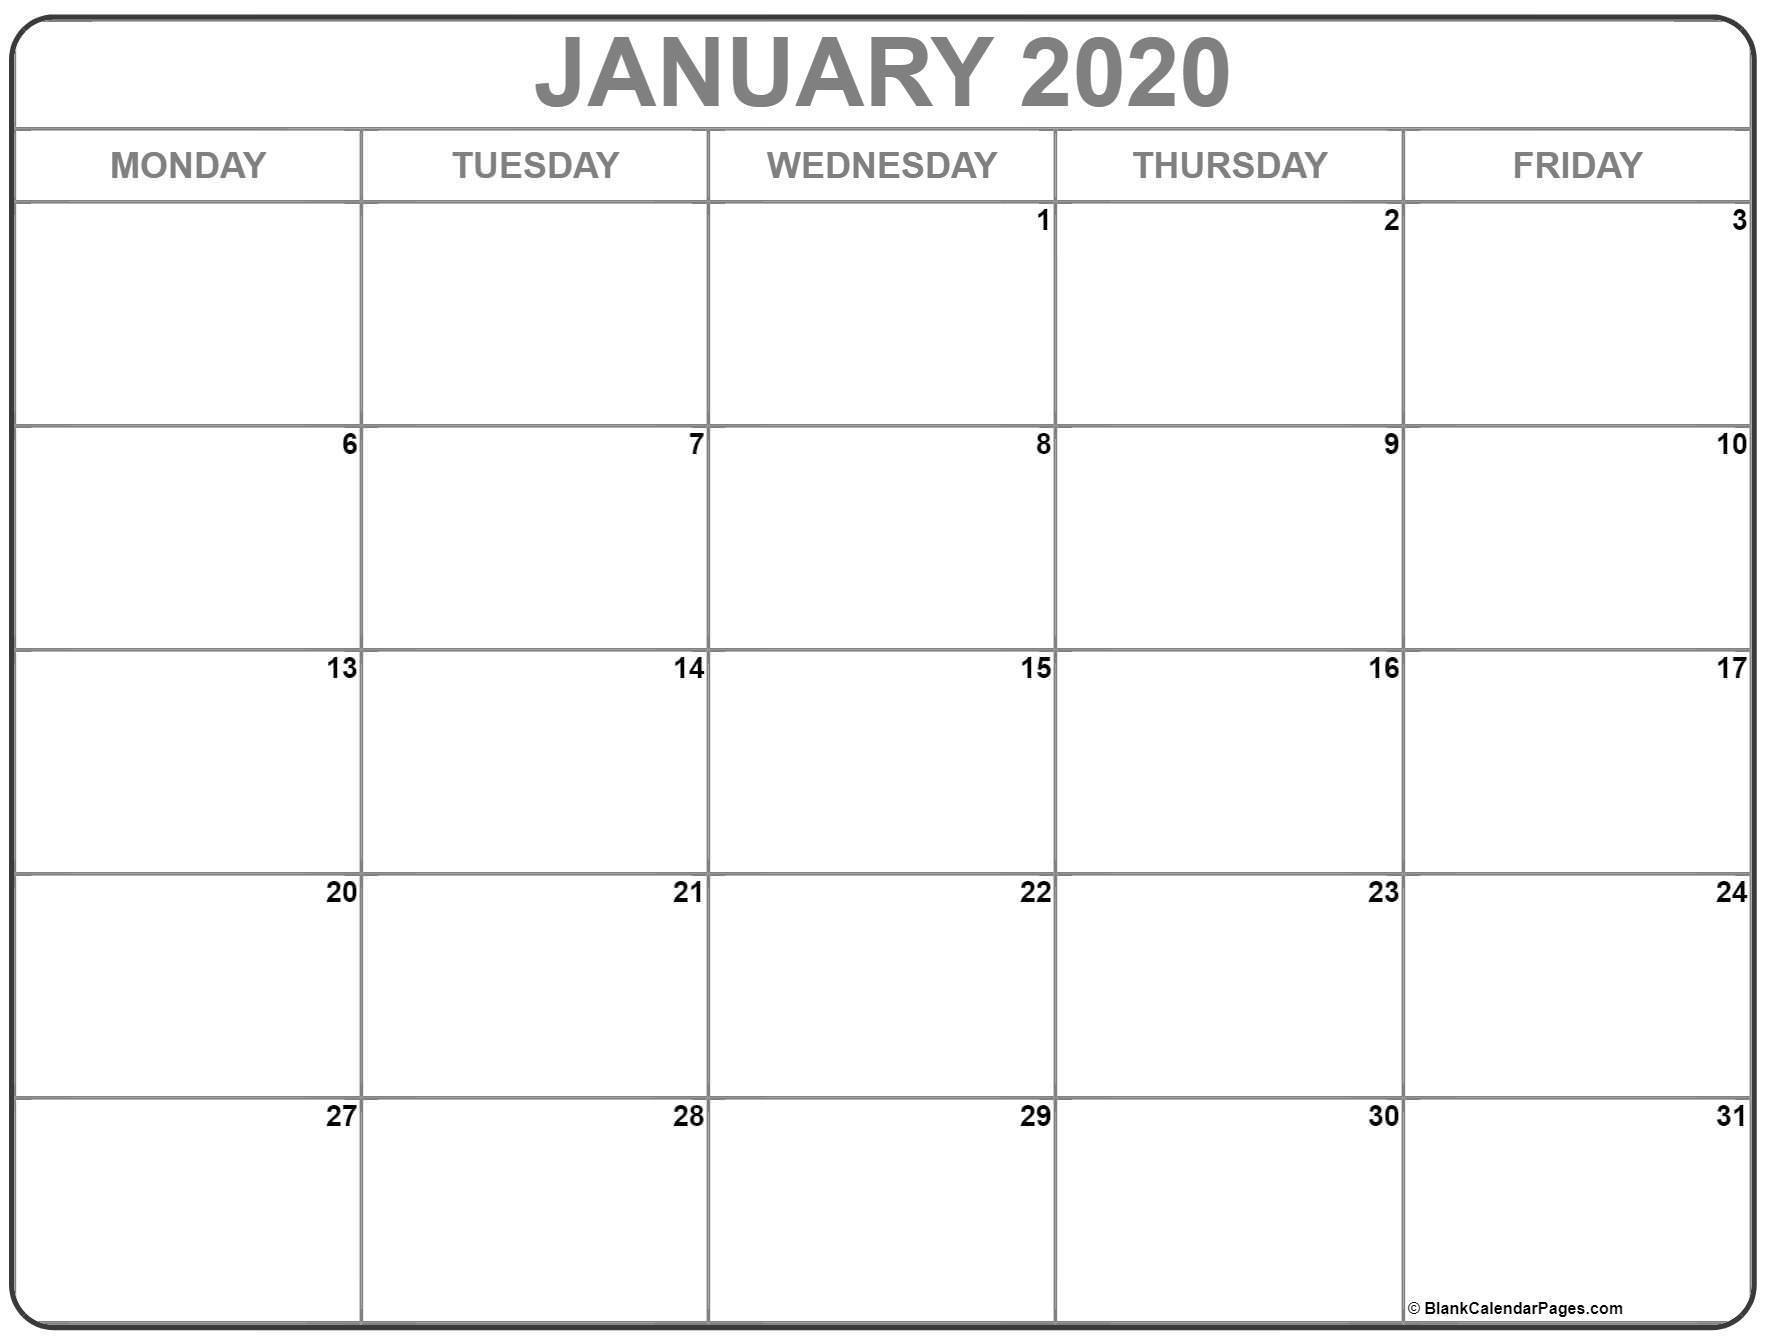 January 2020 Monday Calendar | Monday To Sunday regarding Free Printable Calendar Monday Through Friday